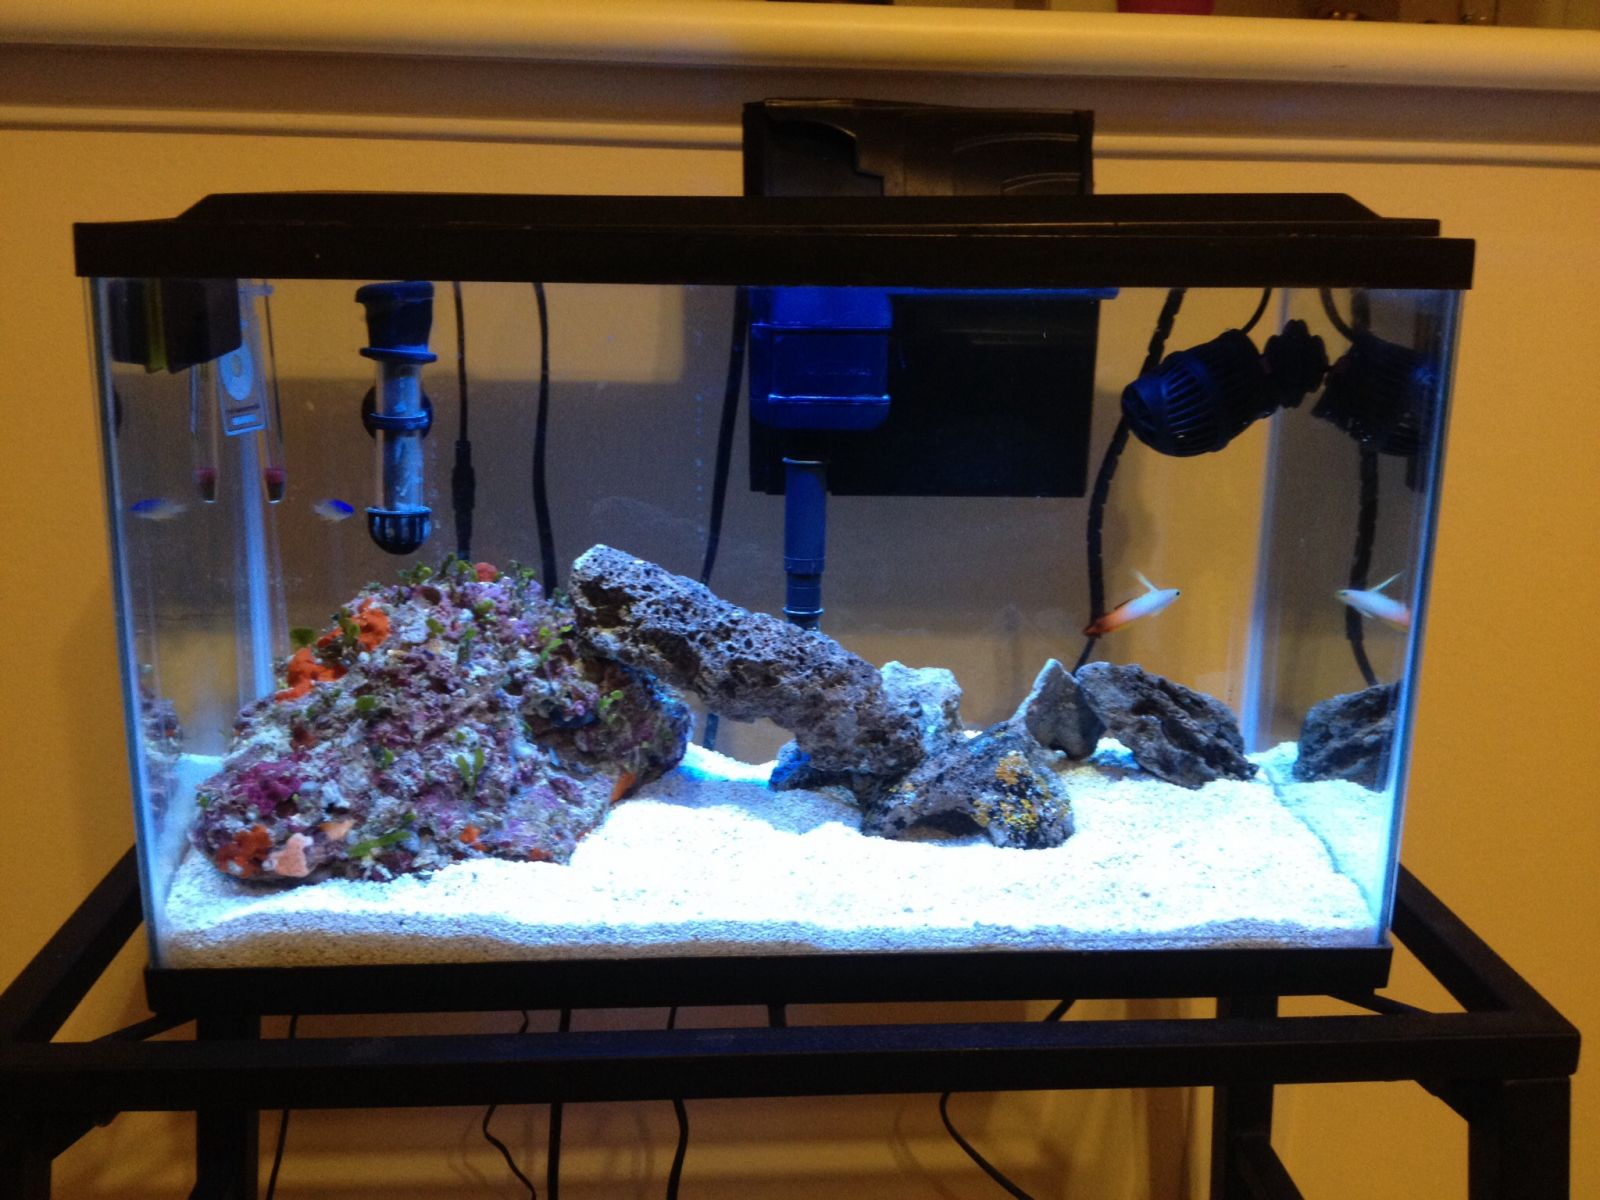 Cornesto 39 s 10 gal budget nano aquarium tank shots nano for 10 gallon fish tank with filter